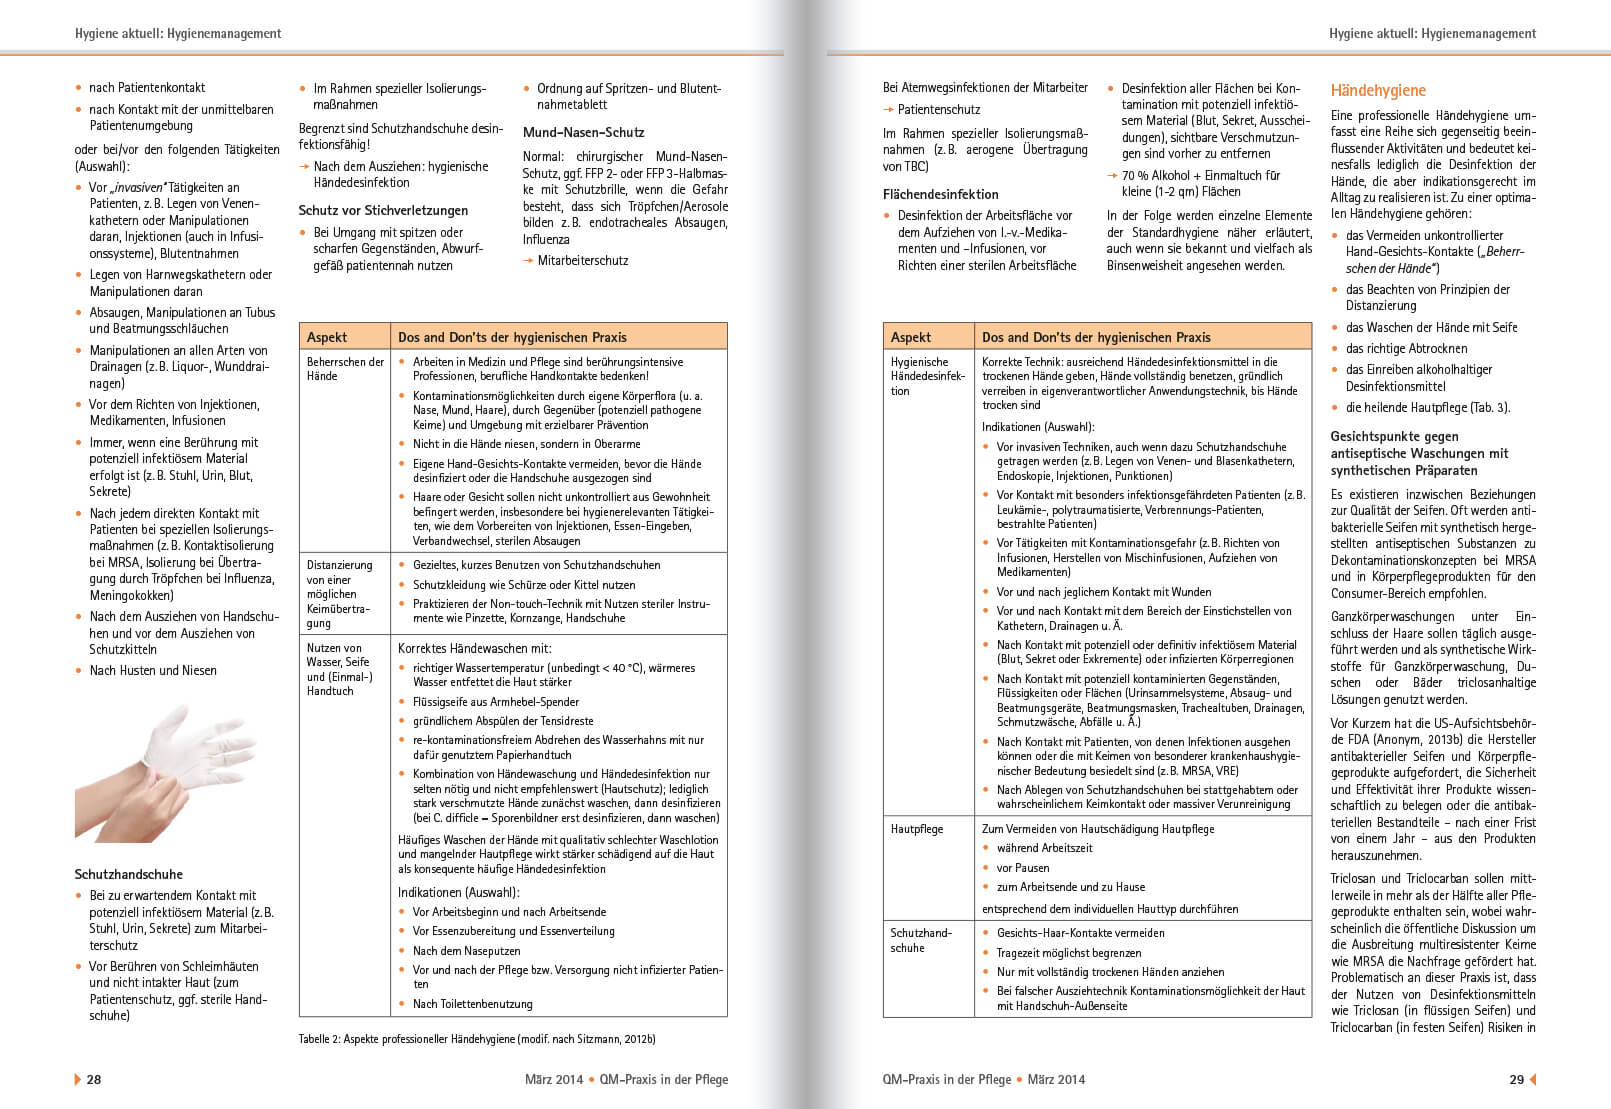 2014-03 Standardhygiene 3